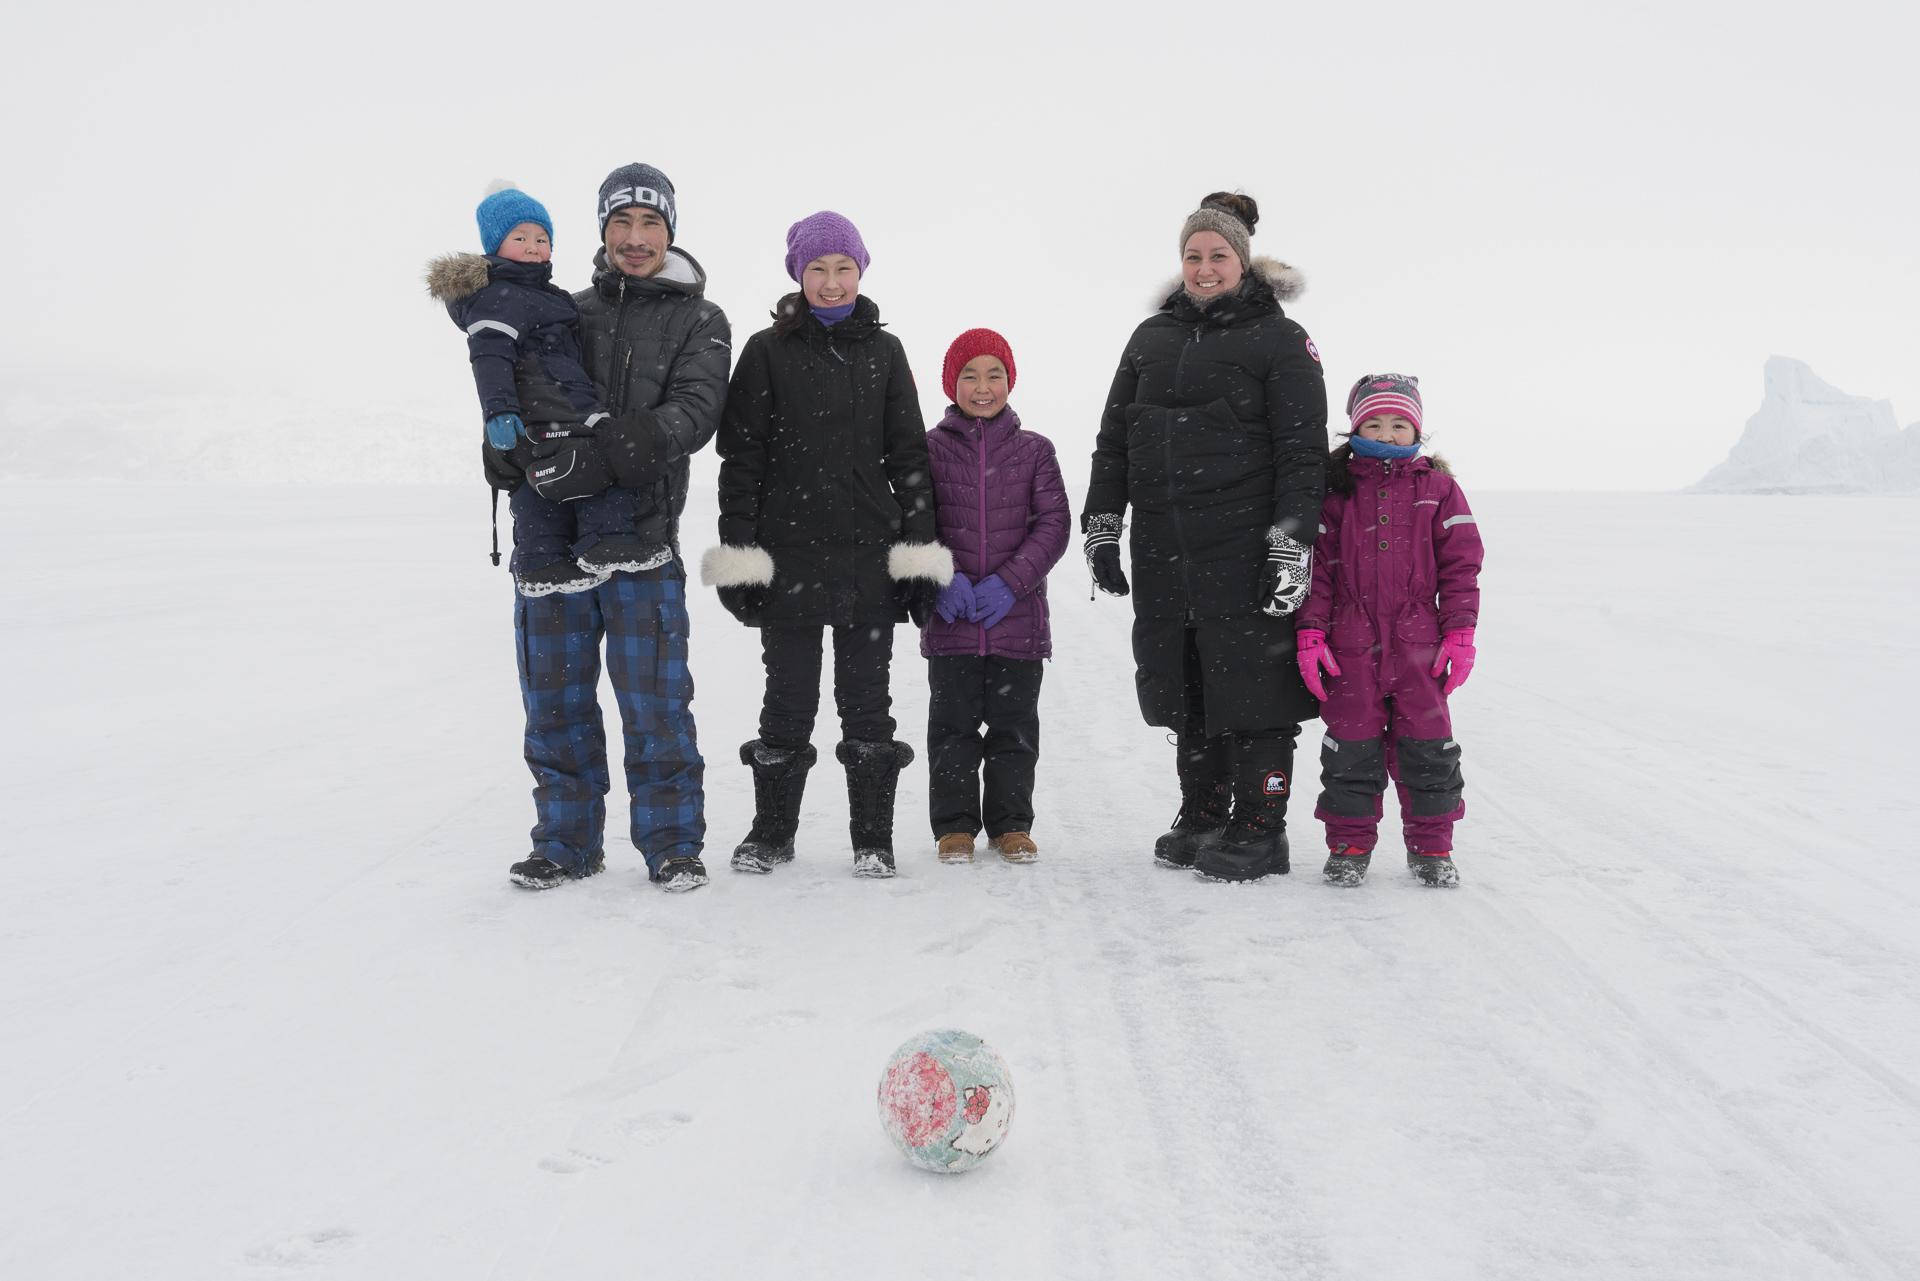 30.Defibaugh_Greenland_Uummannaq_a_120.jpg